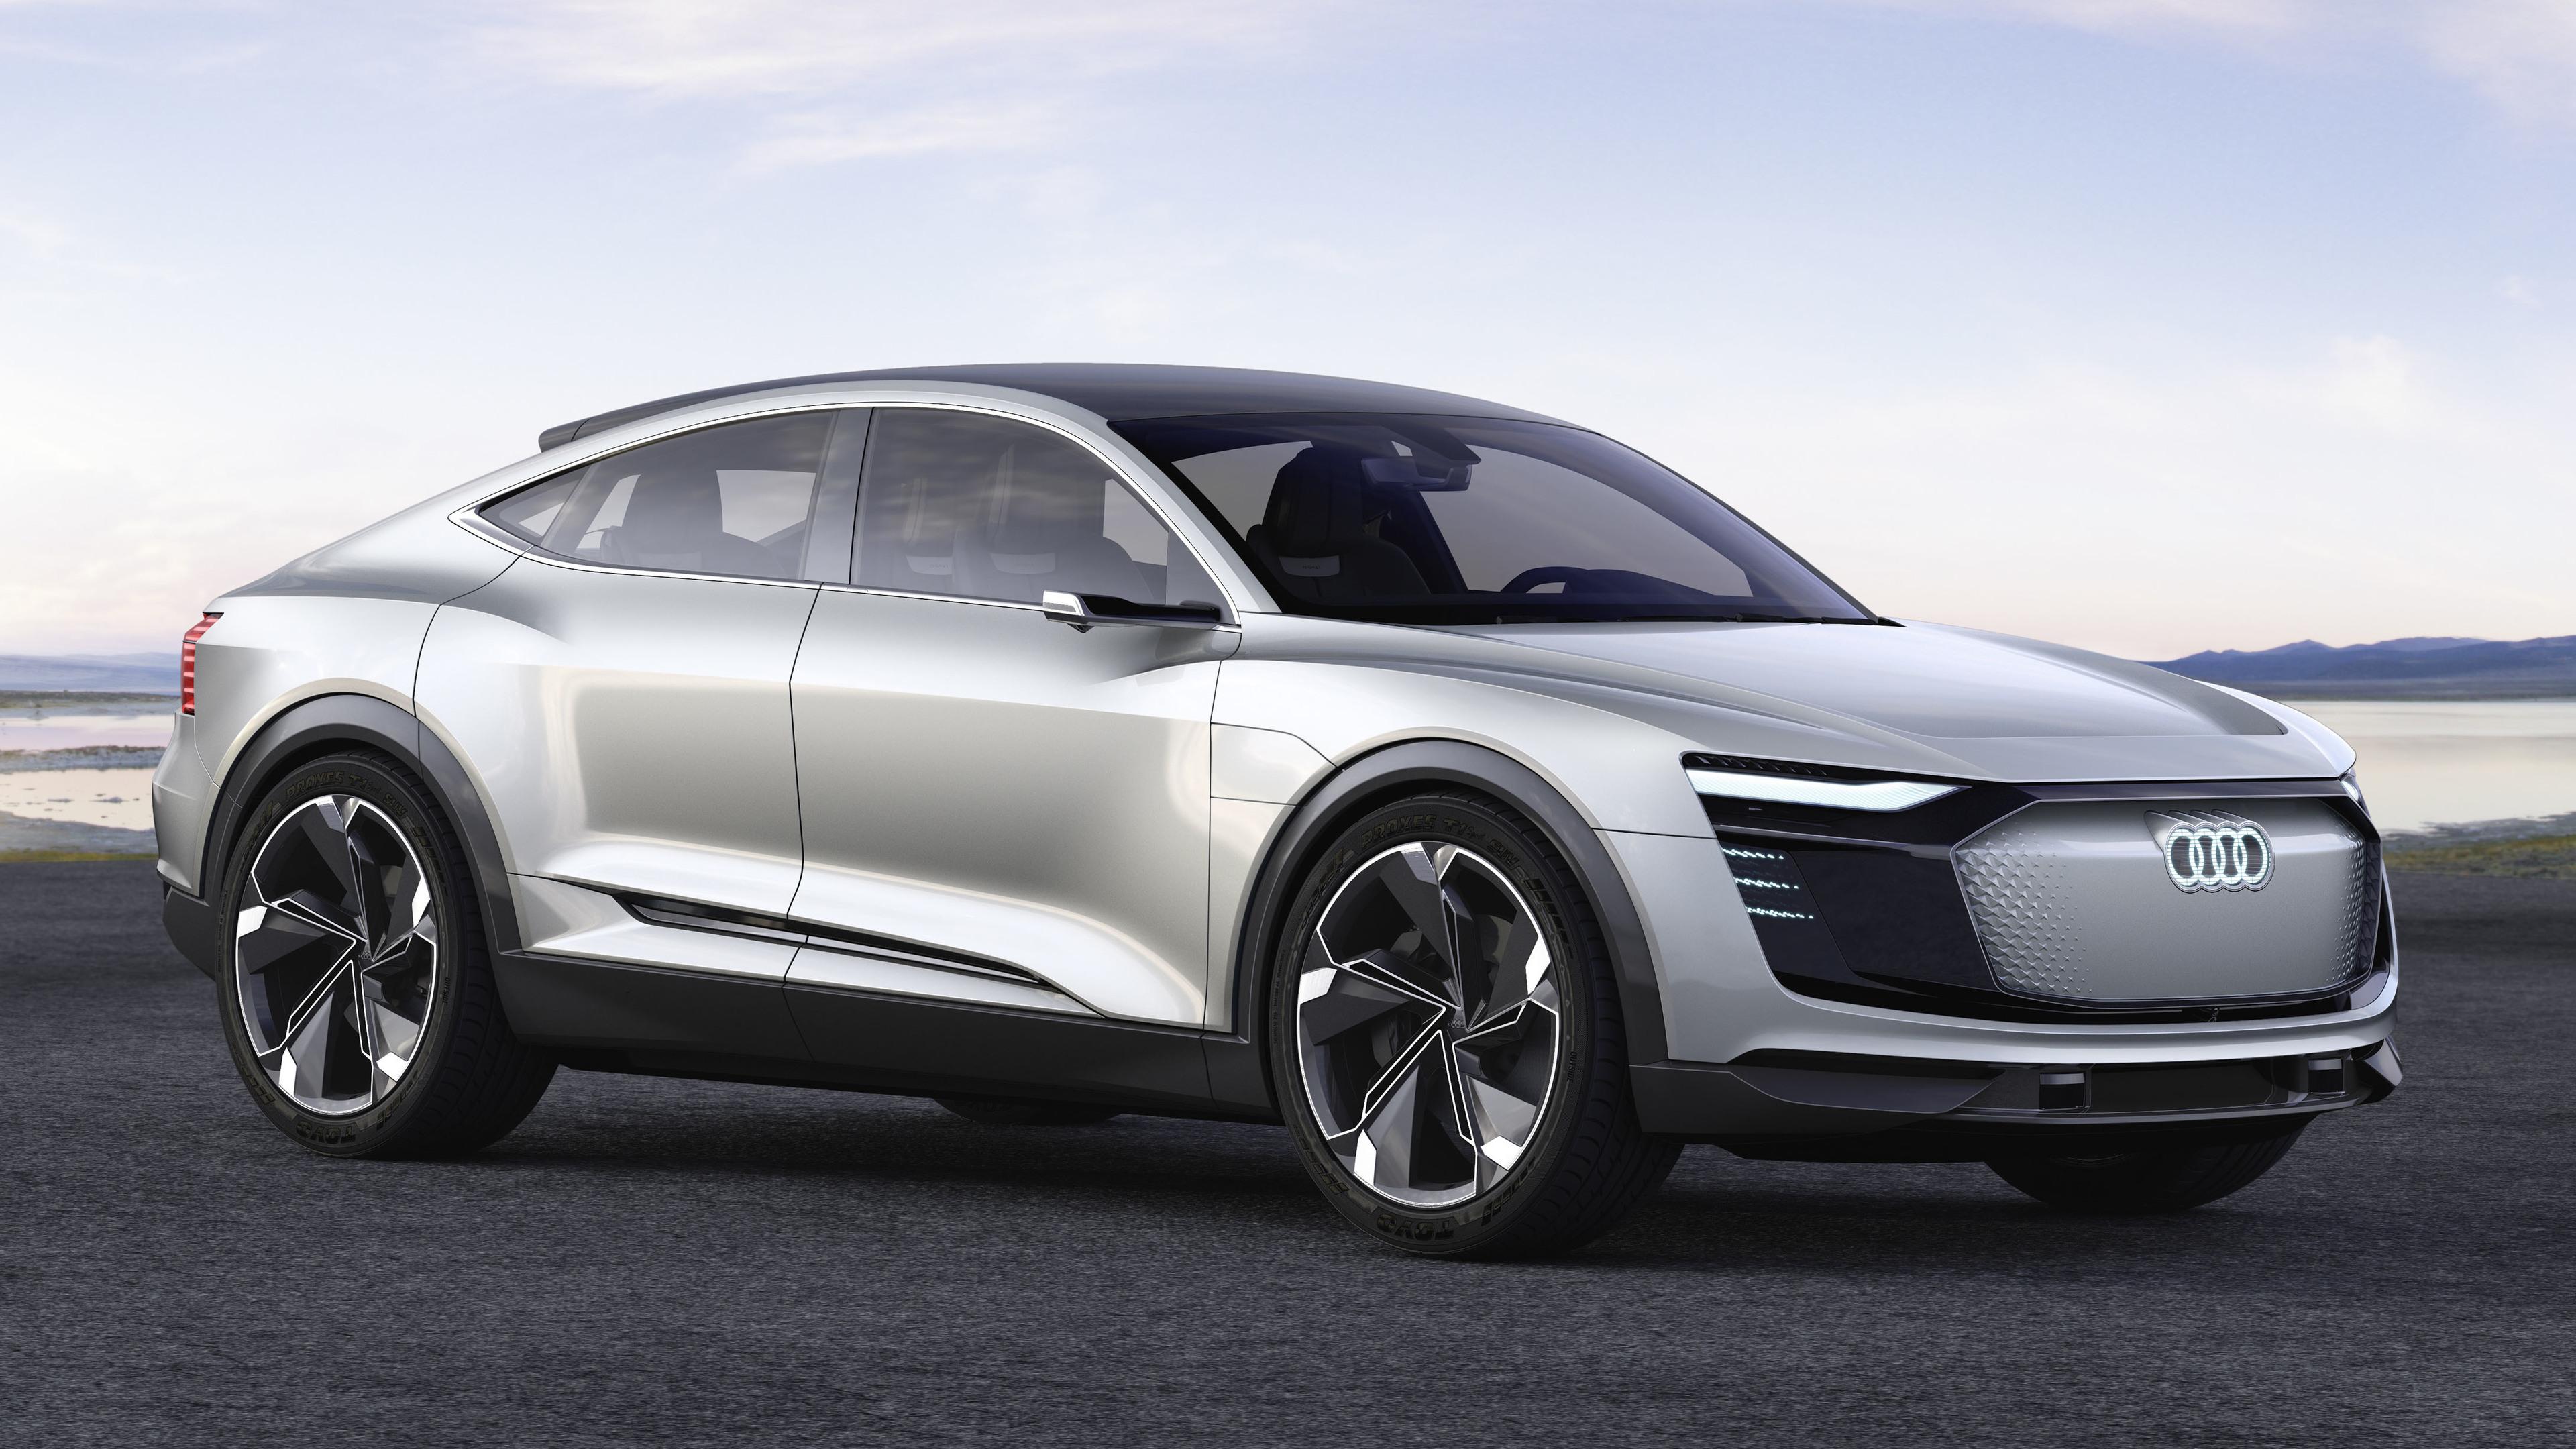 2017 audi e tron 1539105241 - 2017 Audi E Tron - hd-wallpapers, concept cars wallpapers, audi wallpapers, audi e tron wallpapers, 4k-wallpapers, 2017 cars wallpapers